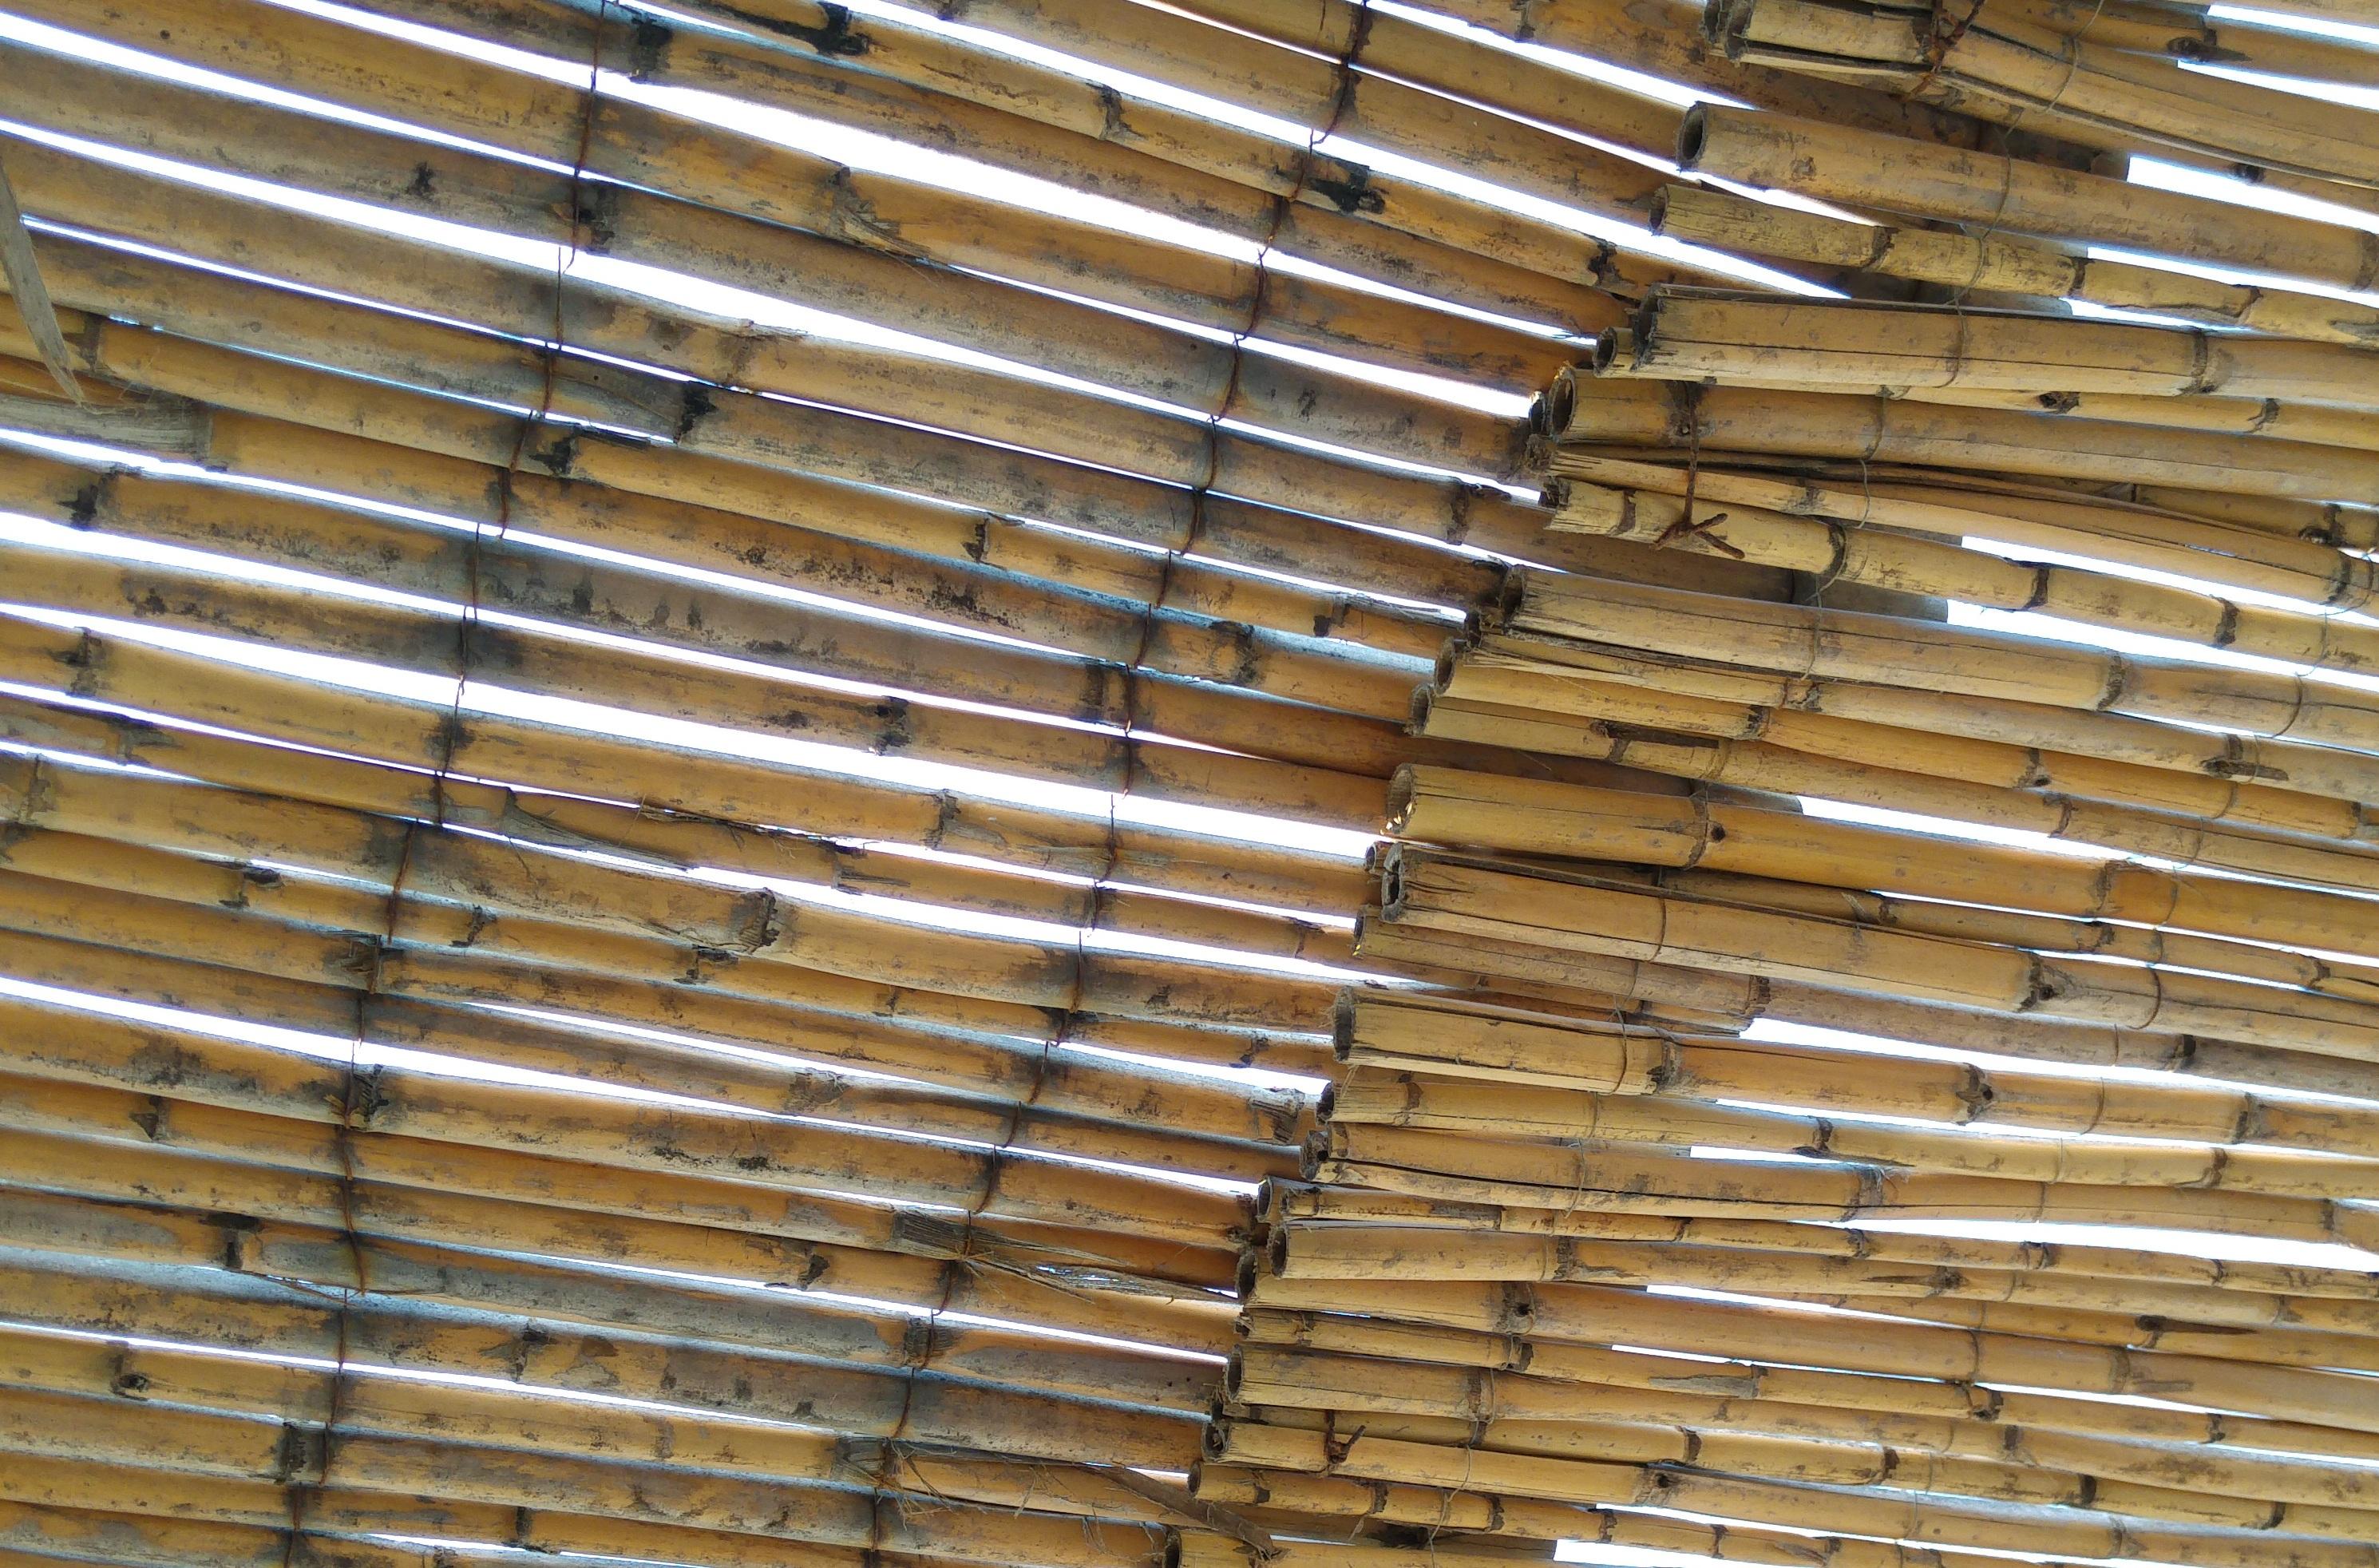 free images : wood, floor, line, canopy, gazebo, lumber, material